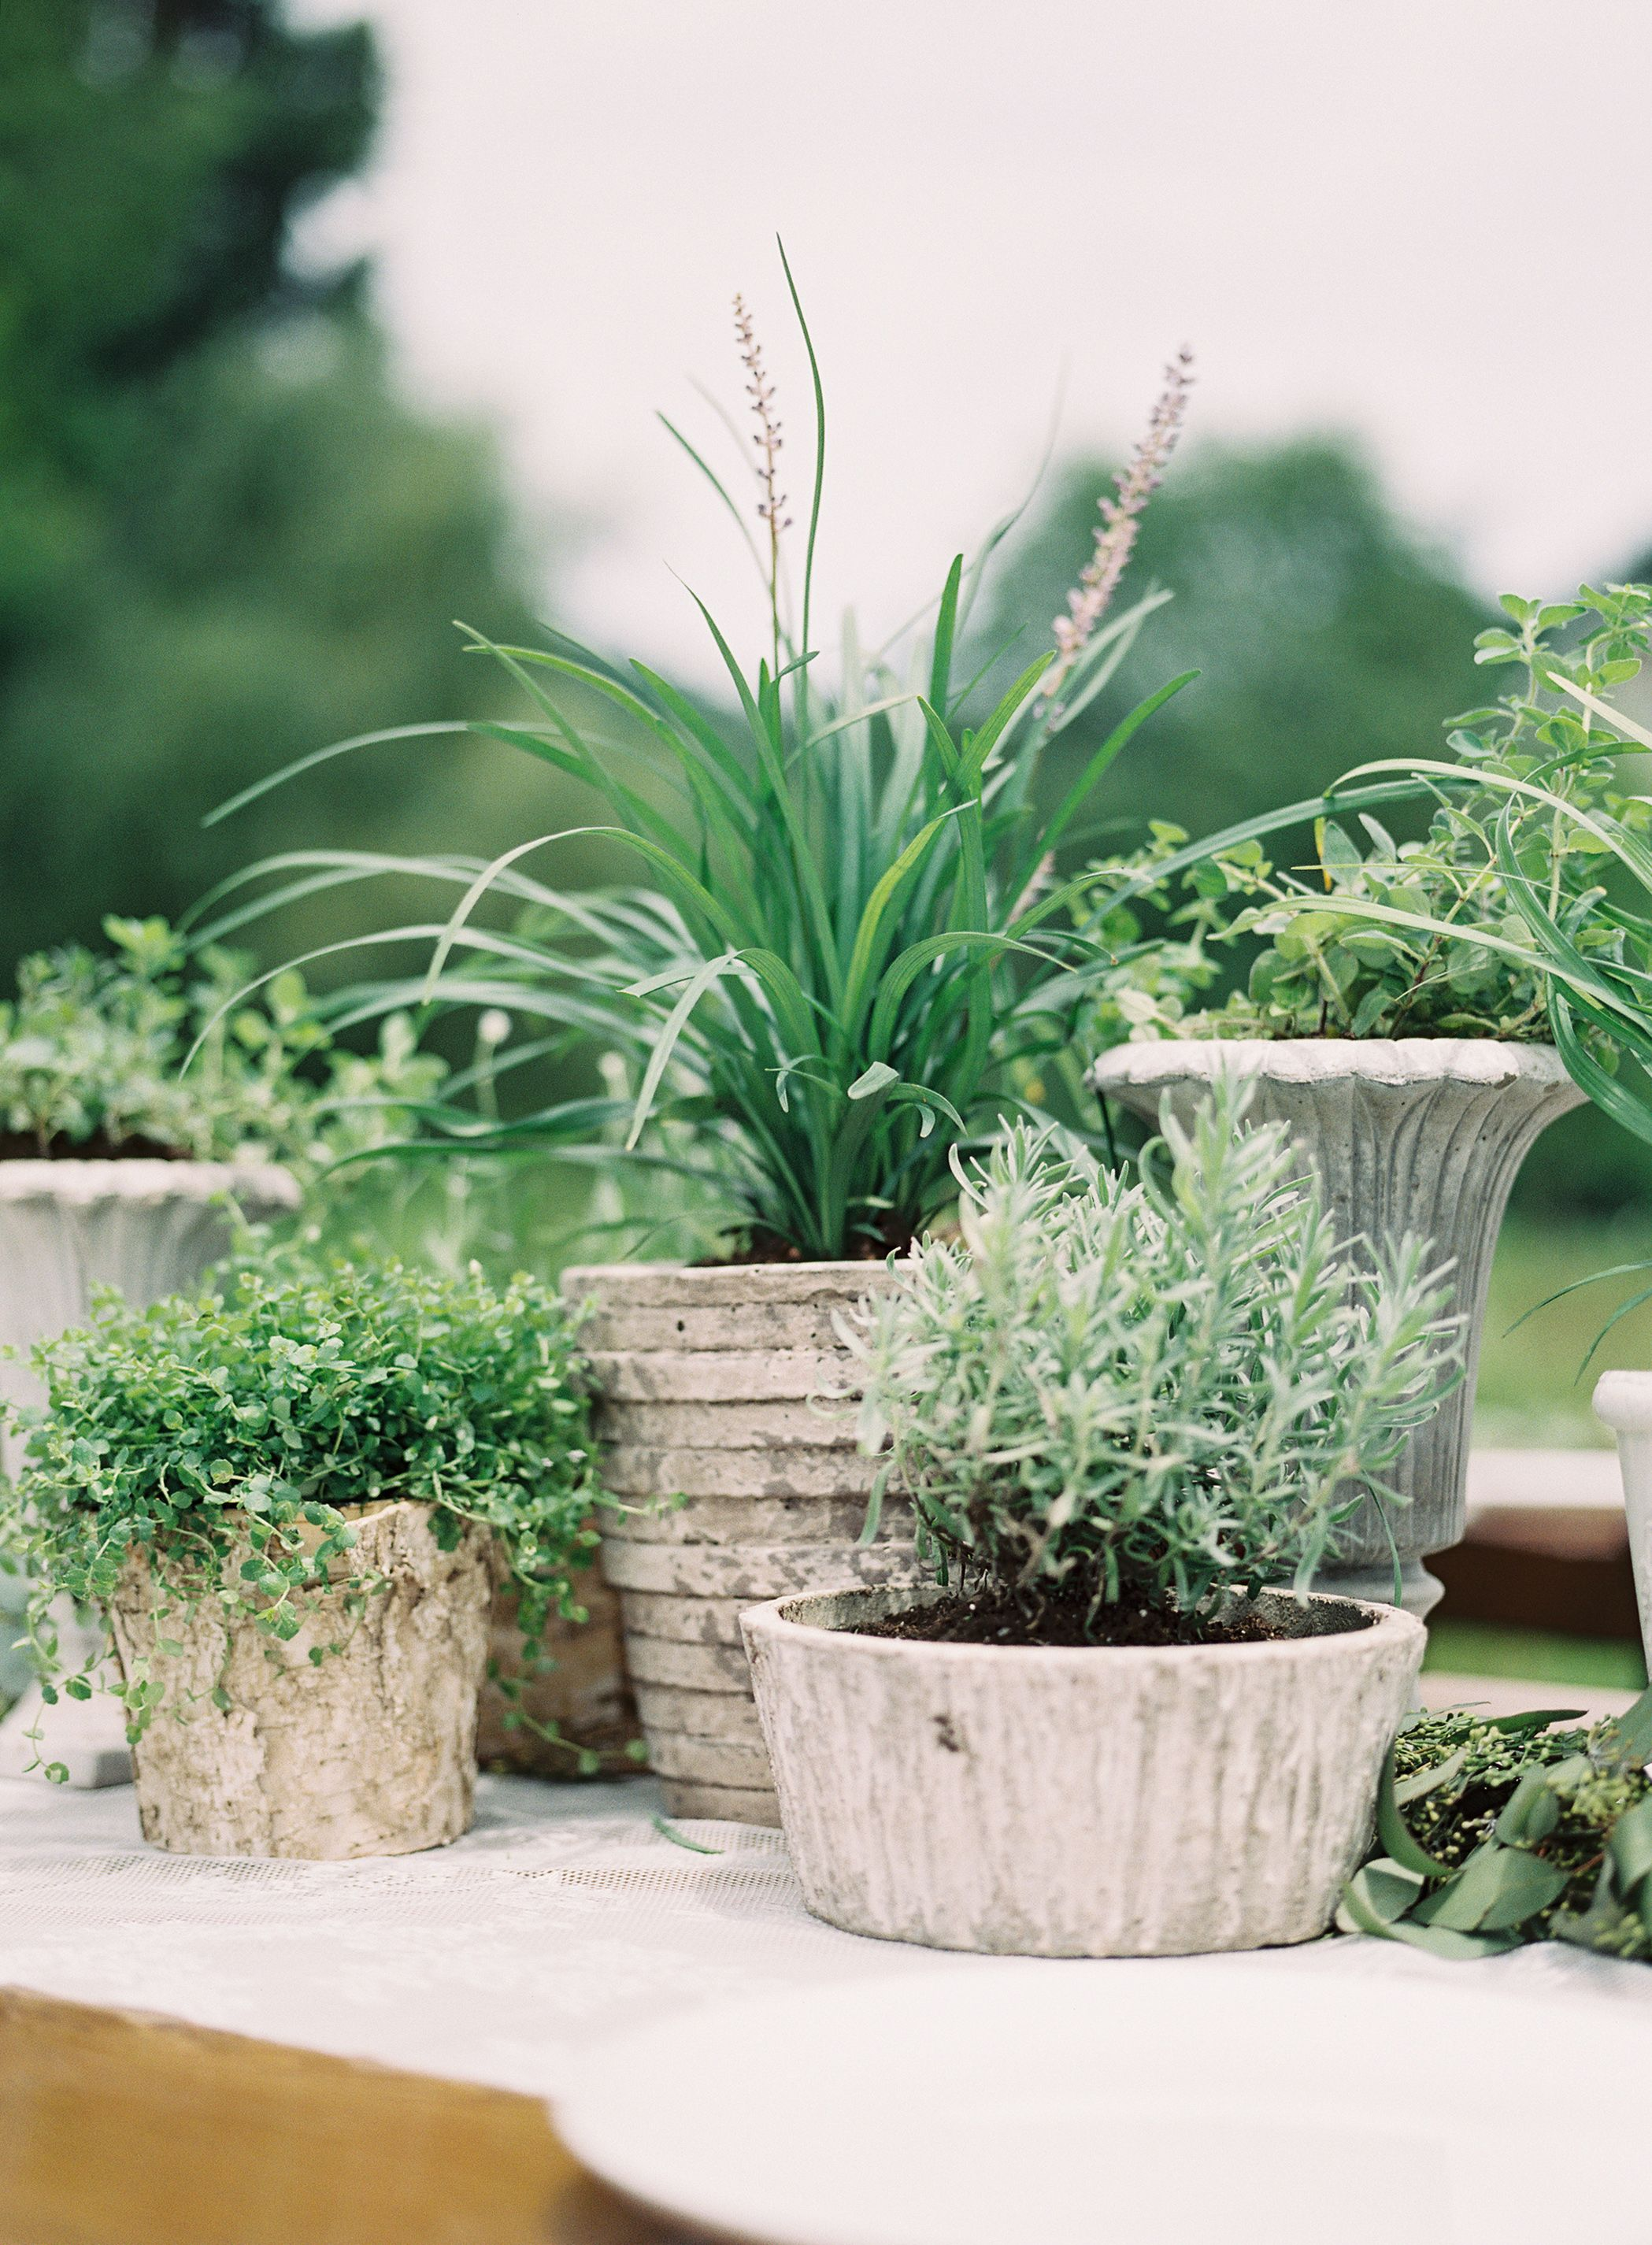 Organic Potted Plant Centerpieces | Wedding | Pinterest | Plant ...